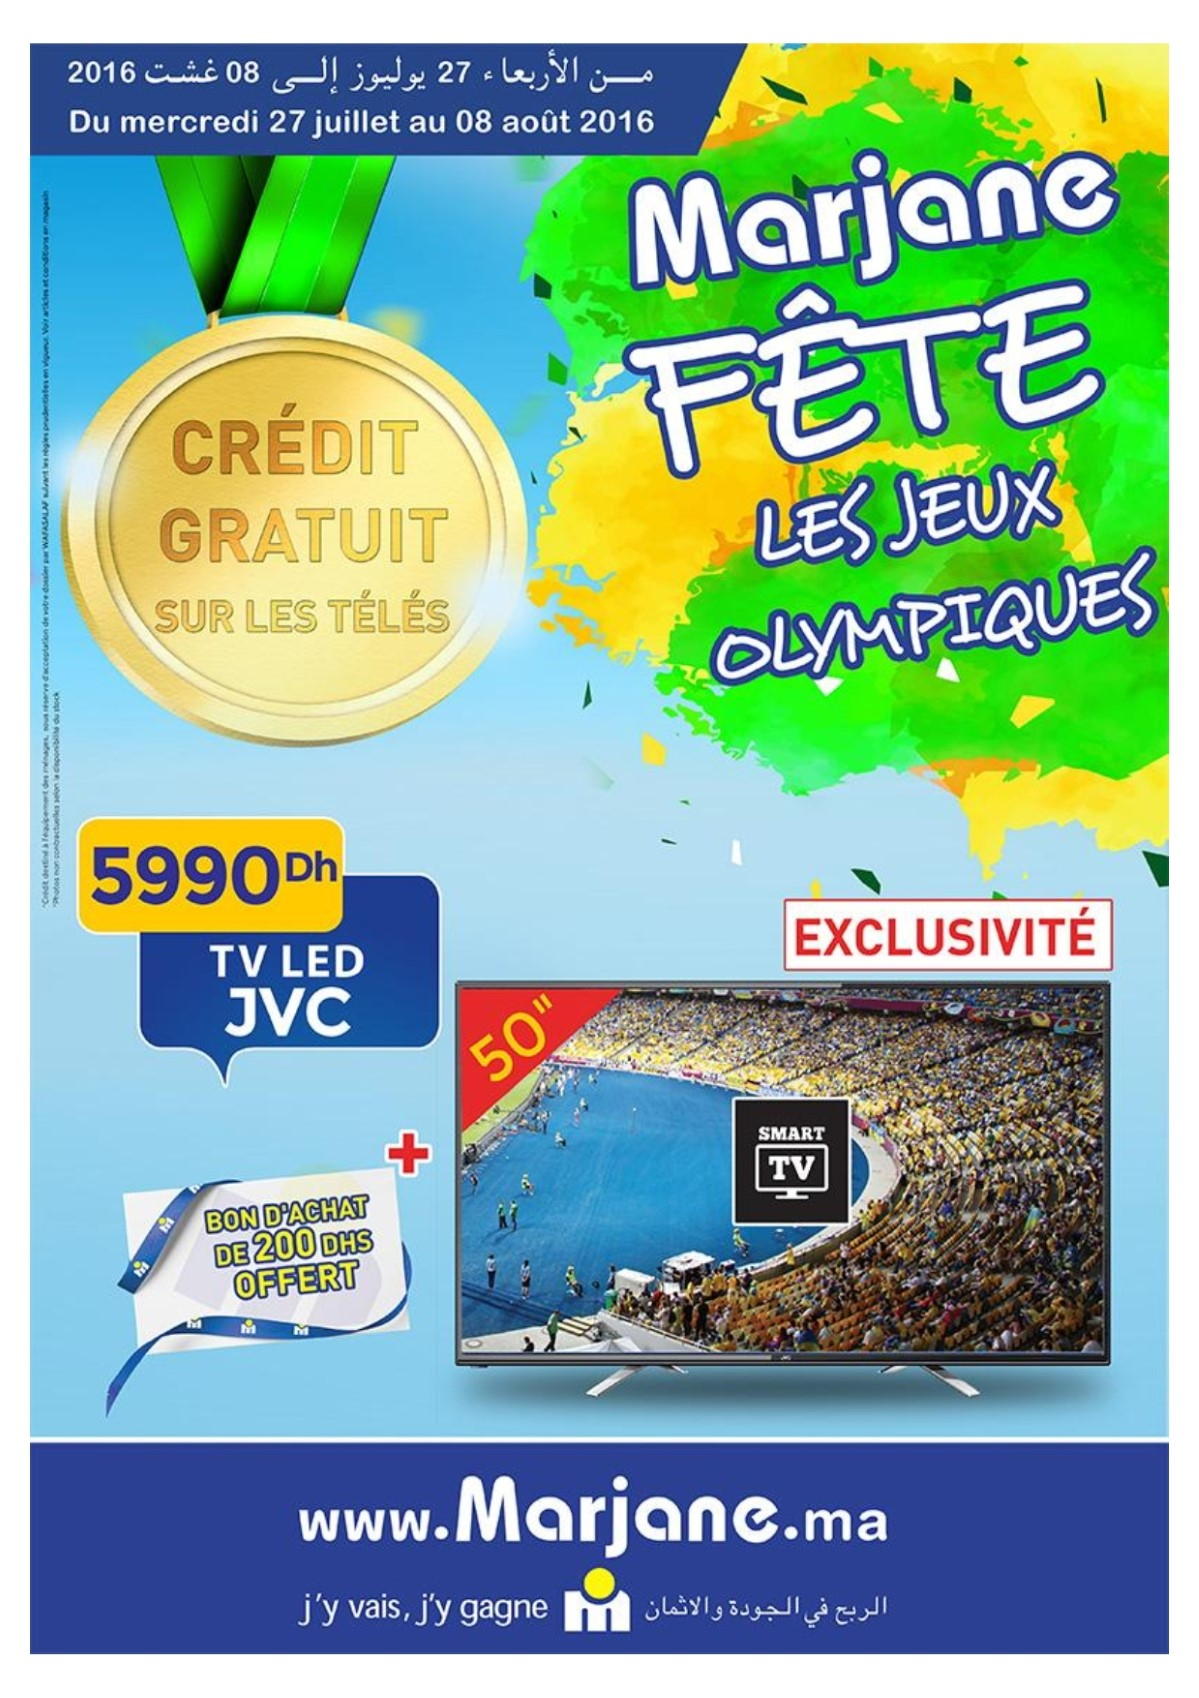 depliant_marjane_jeux_olympiques_2016_001